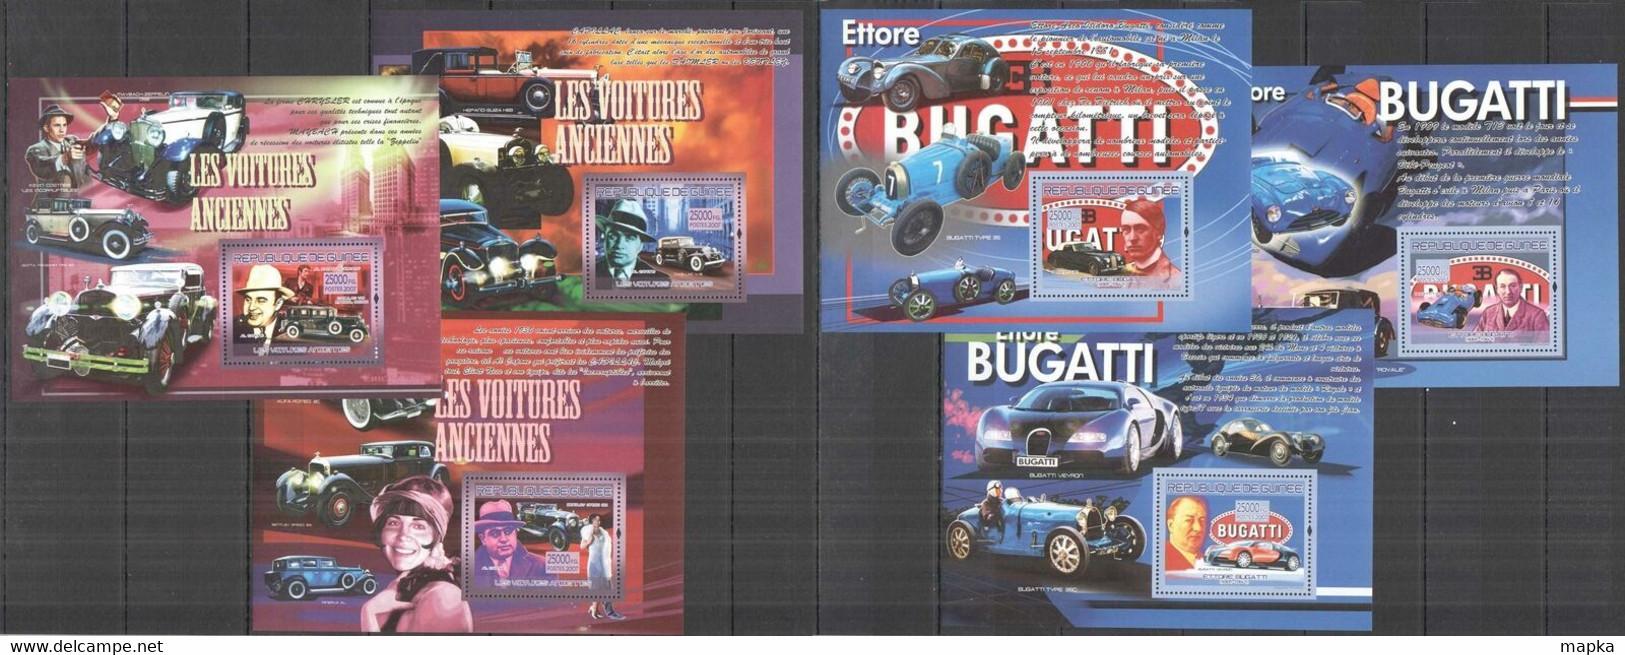 BC1395 2007 GUINEE GUINEA ANTIQUE AUTOMOBILES BUGATTI CARS HISTORY !!! 6BL MNH - Cars